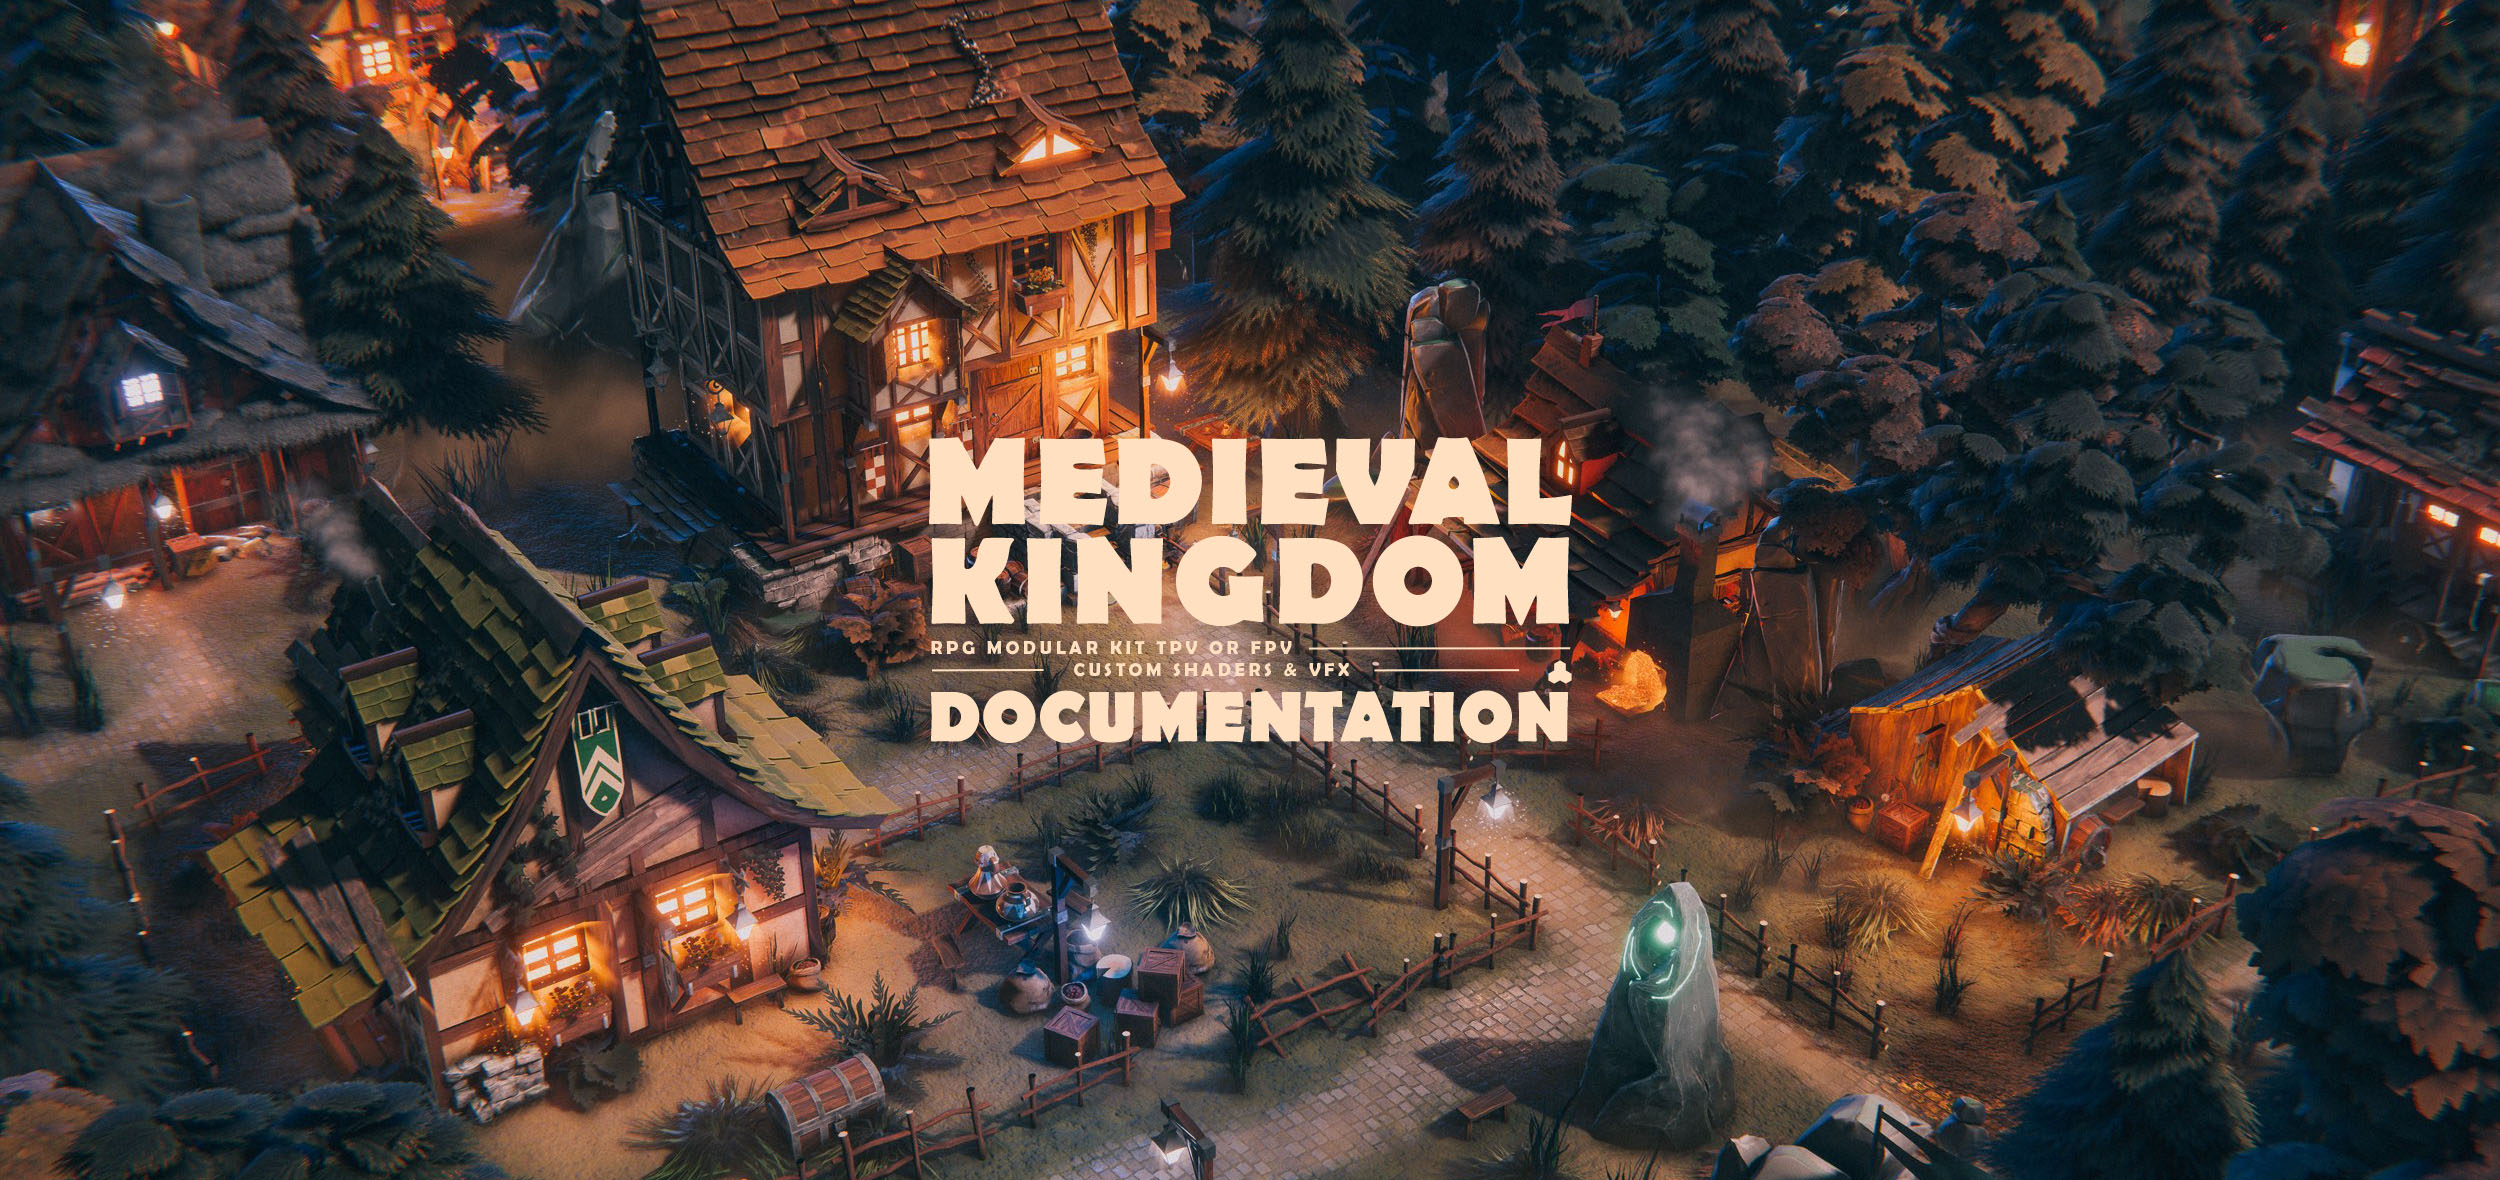 RPG_Medieval_Kingdom_Documentation.jpg